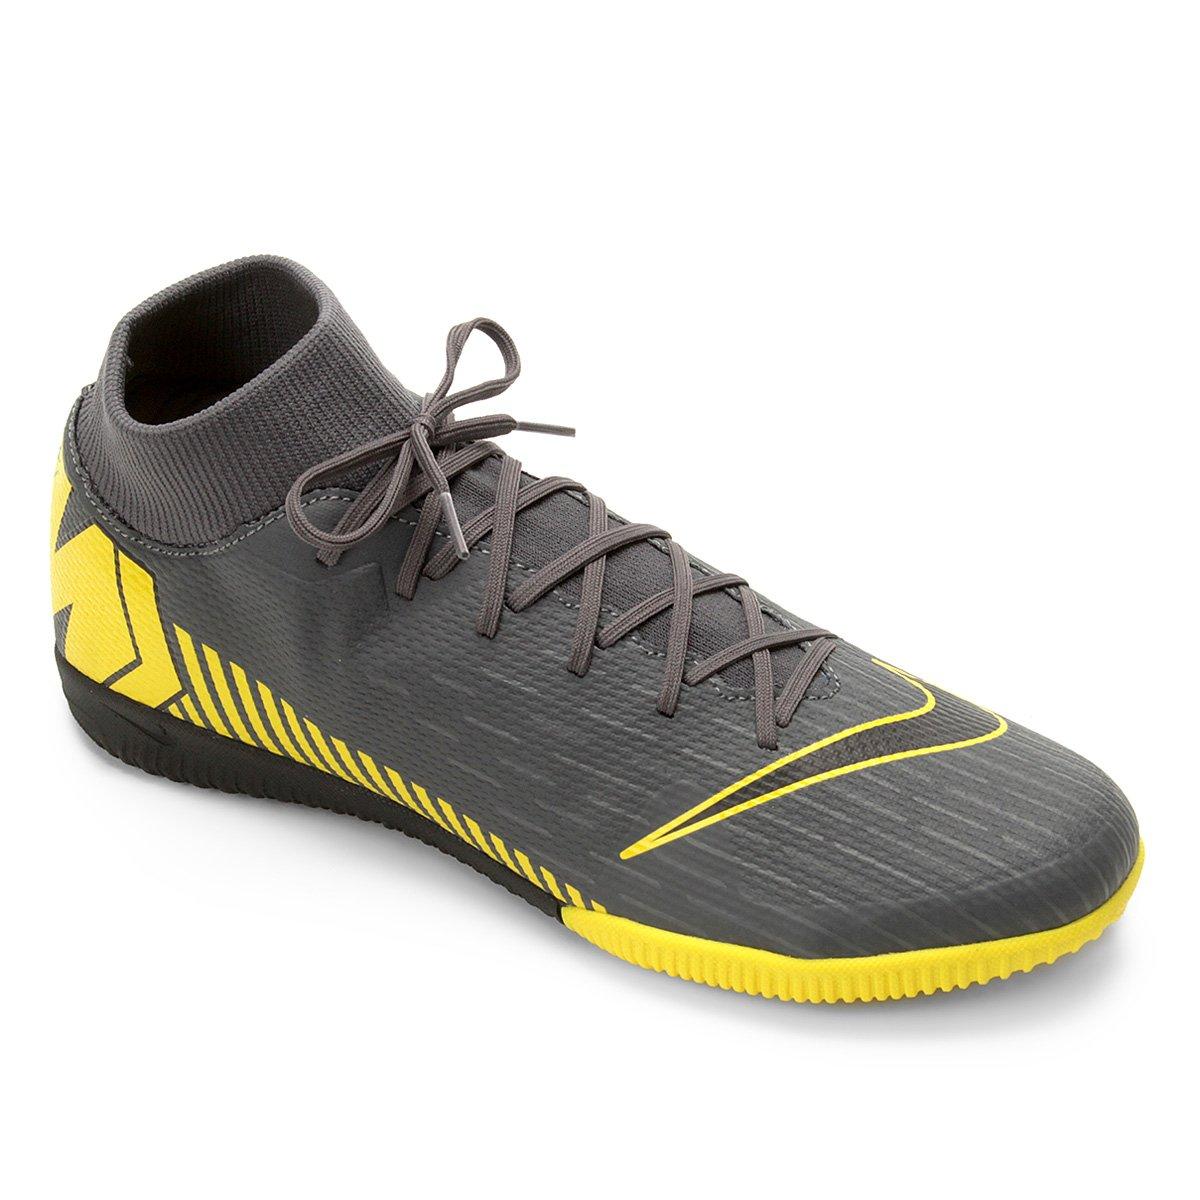 84e1d4df96 Chuteira Futsal Nike Mercurial Superfly 6 Academy IC